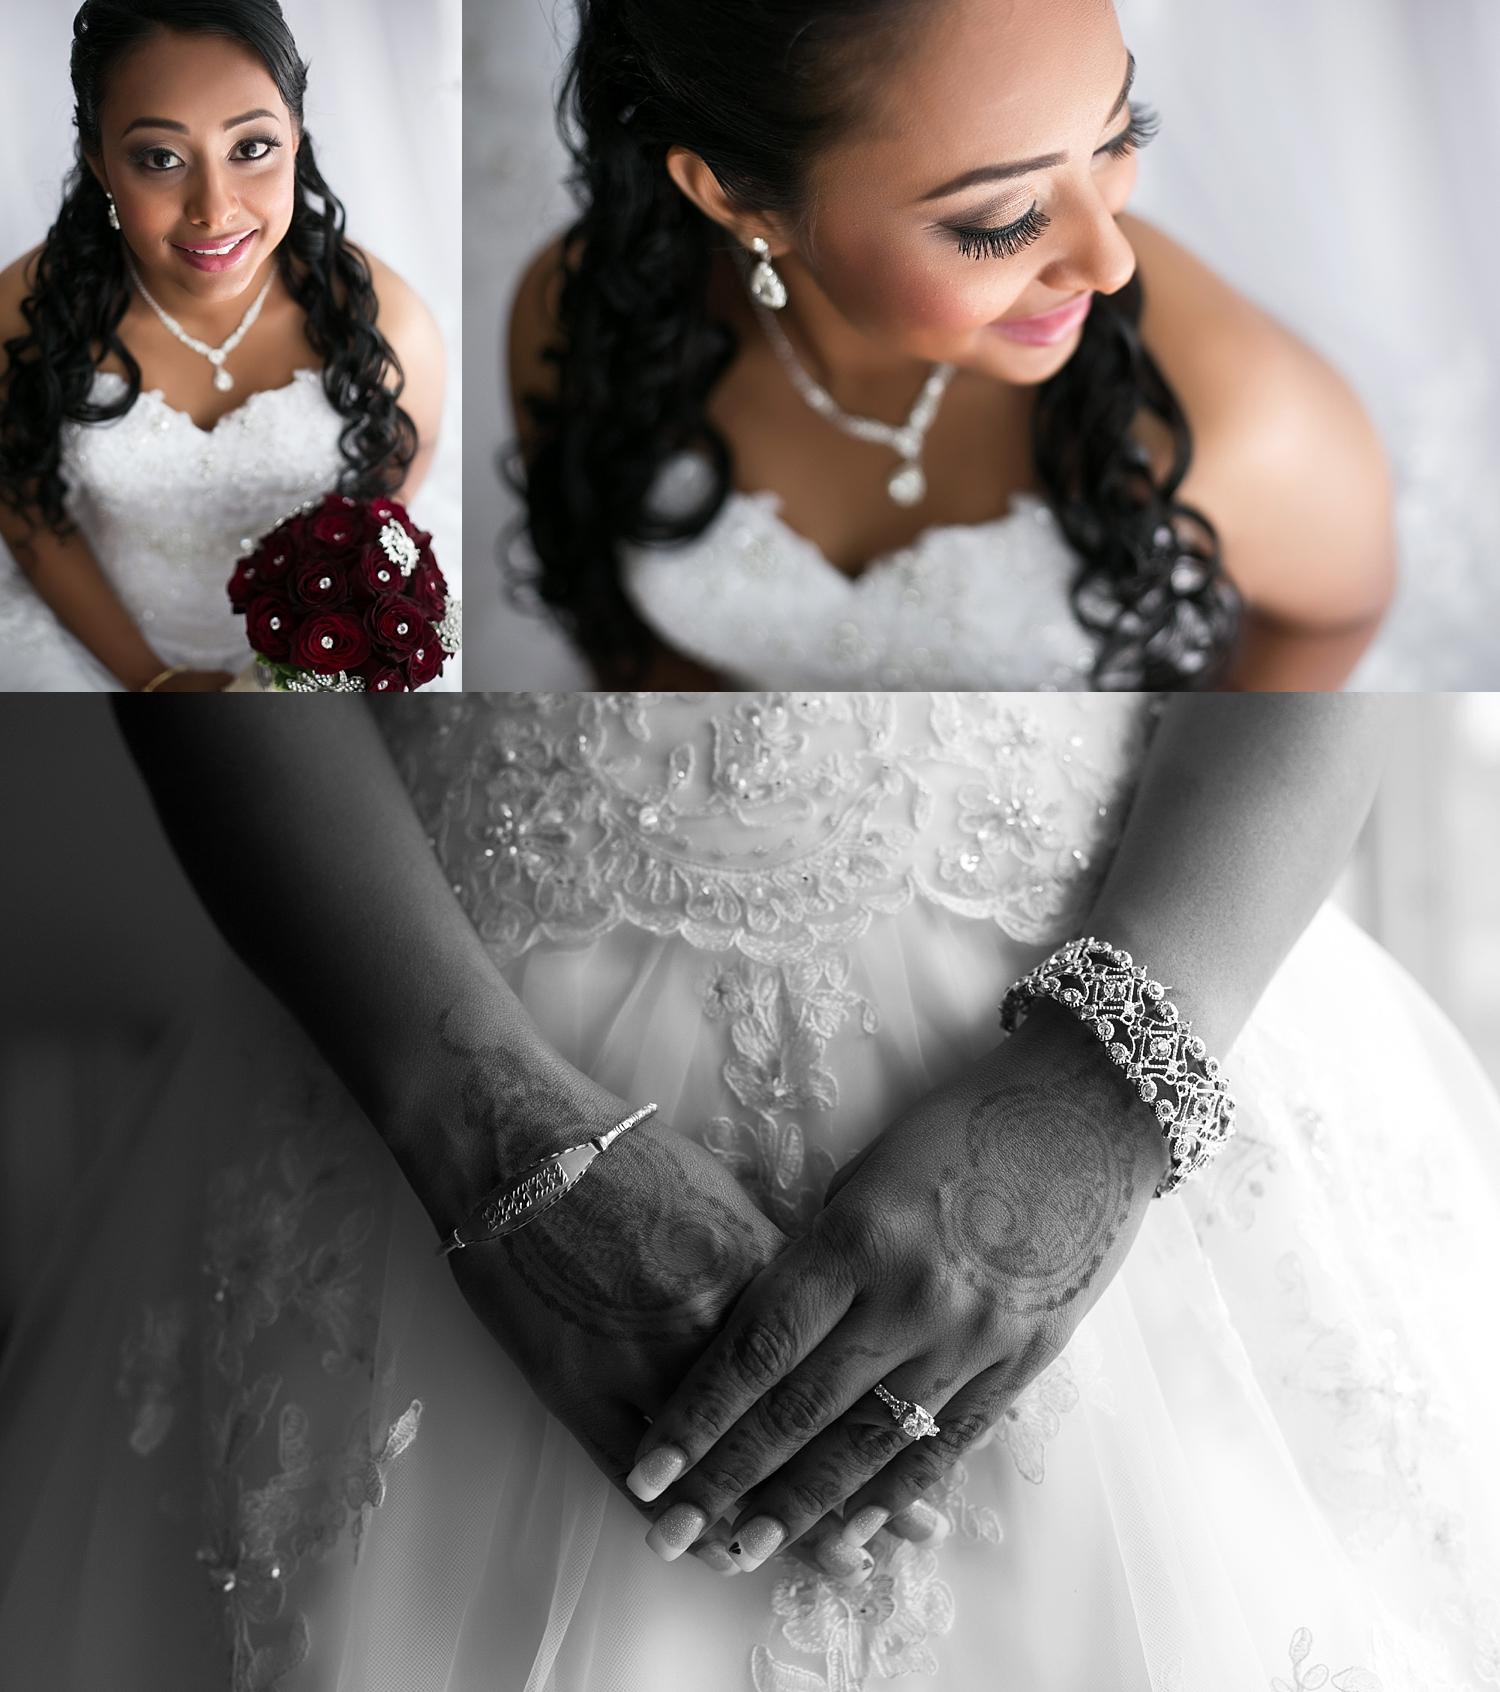 sacred_heart_wedding_0206.jpg